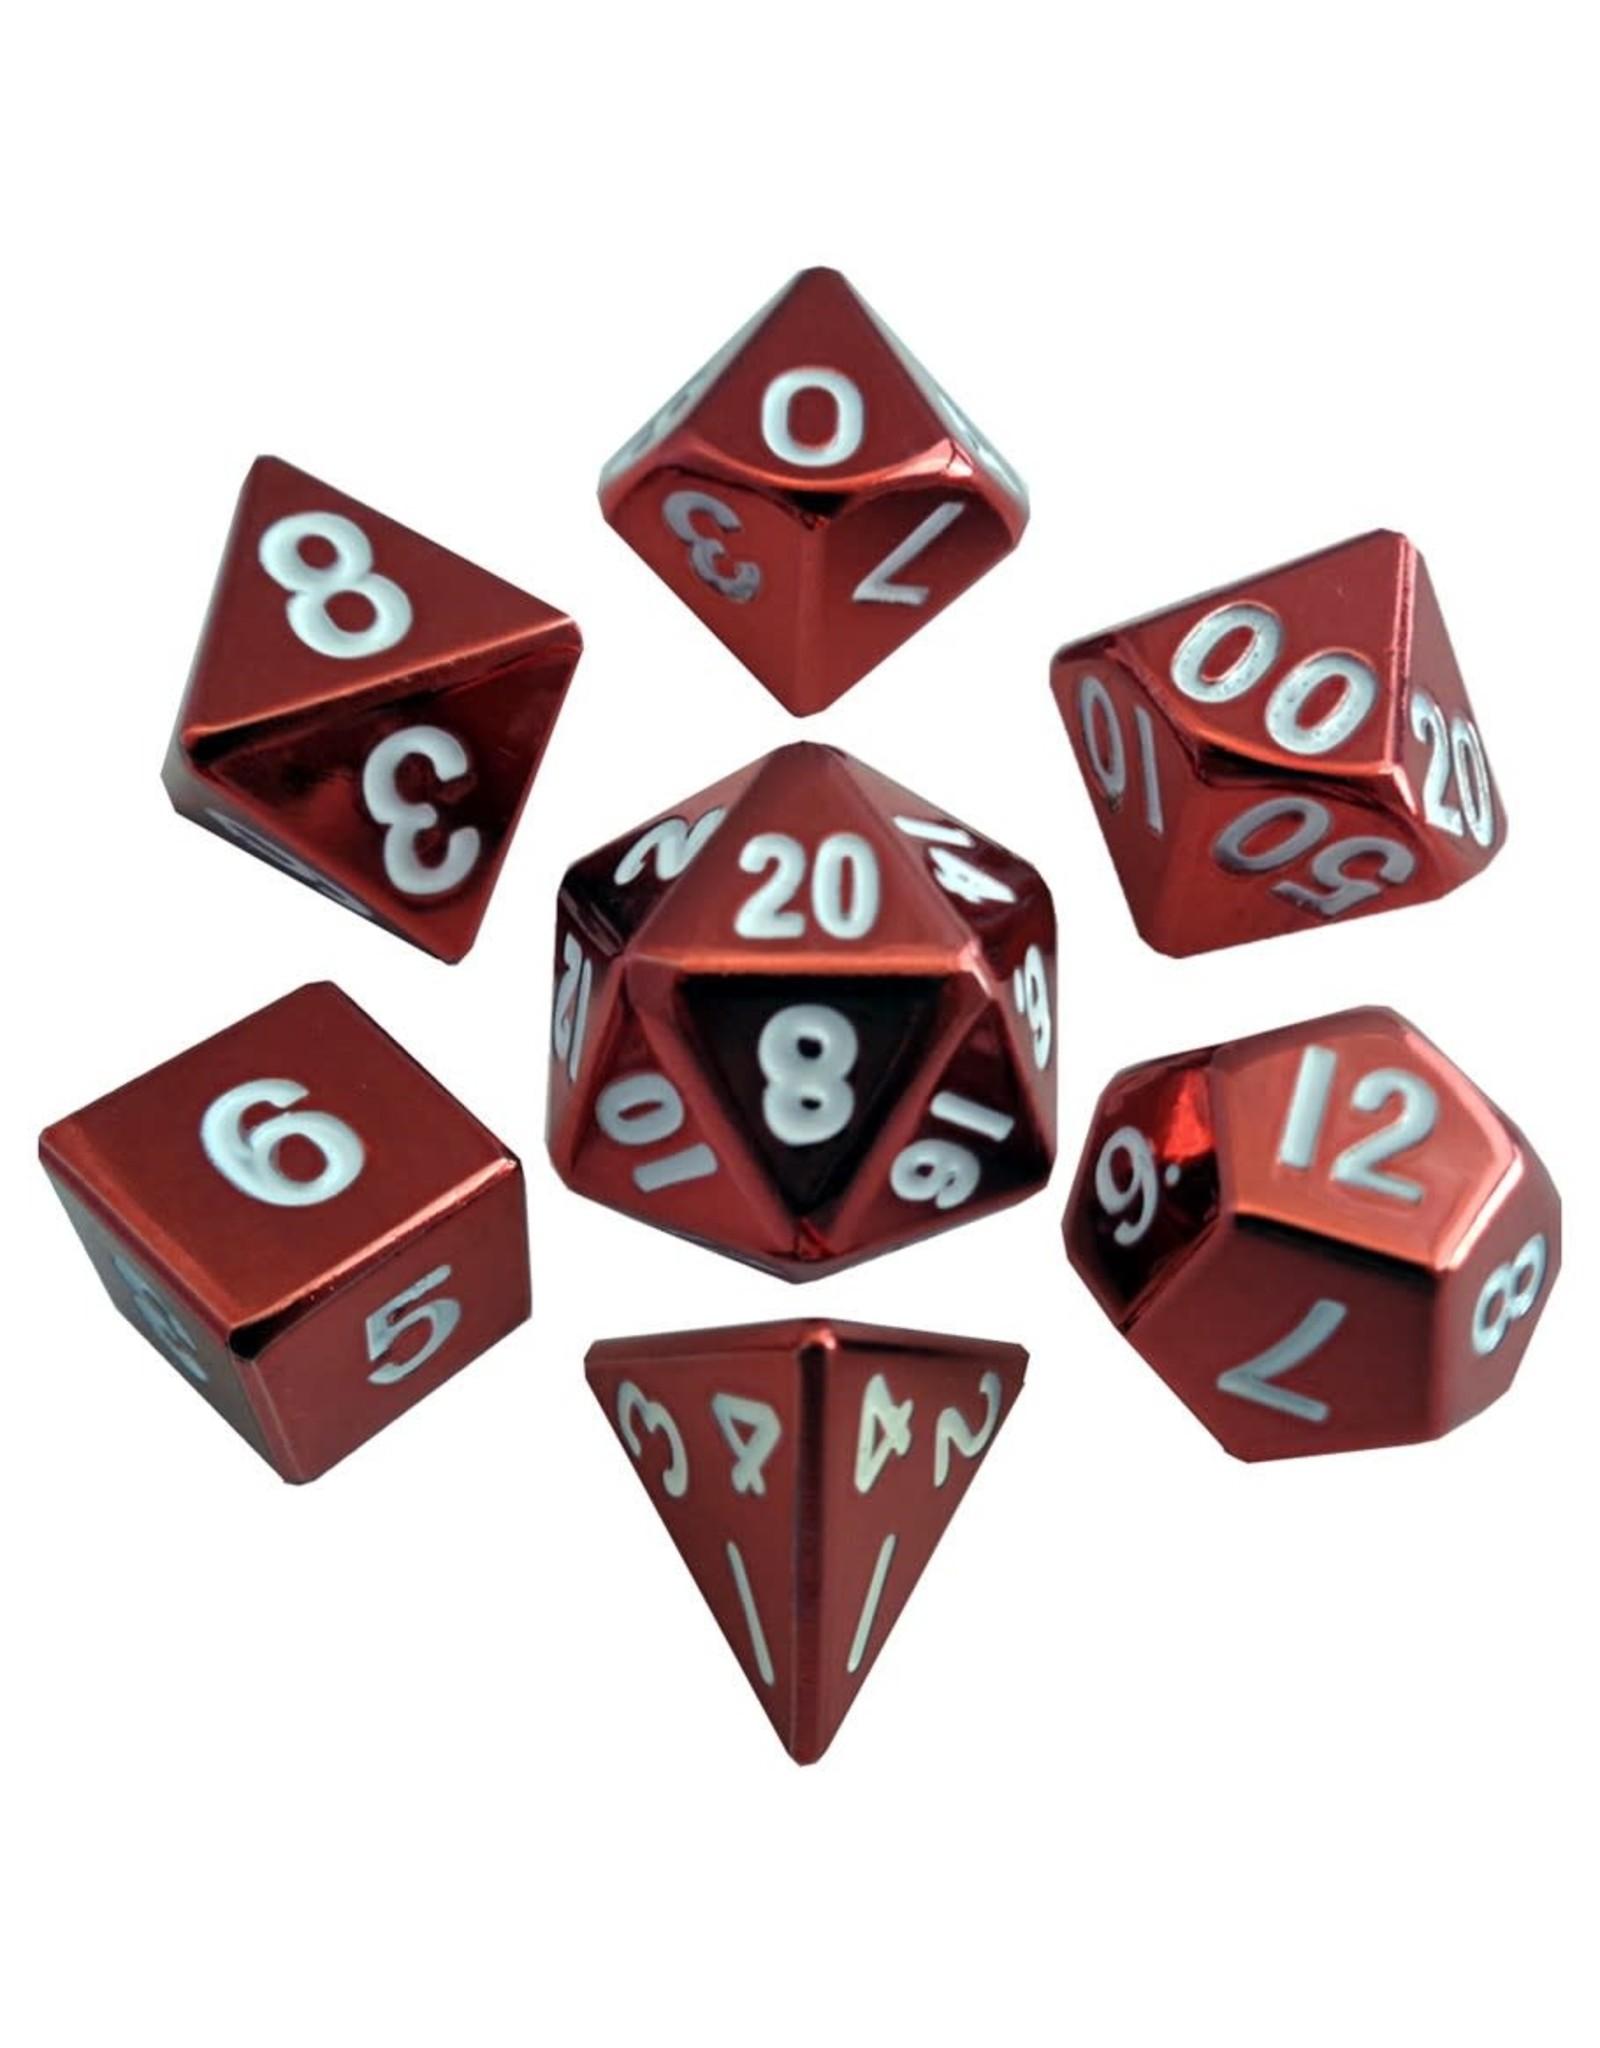 Metallic Dice Games 7-set: RD Painted Metal